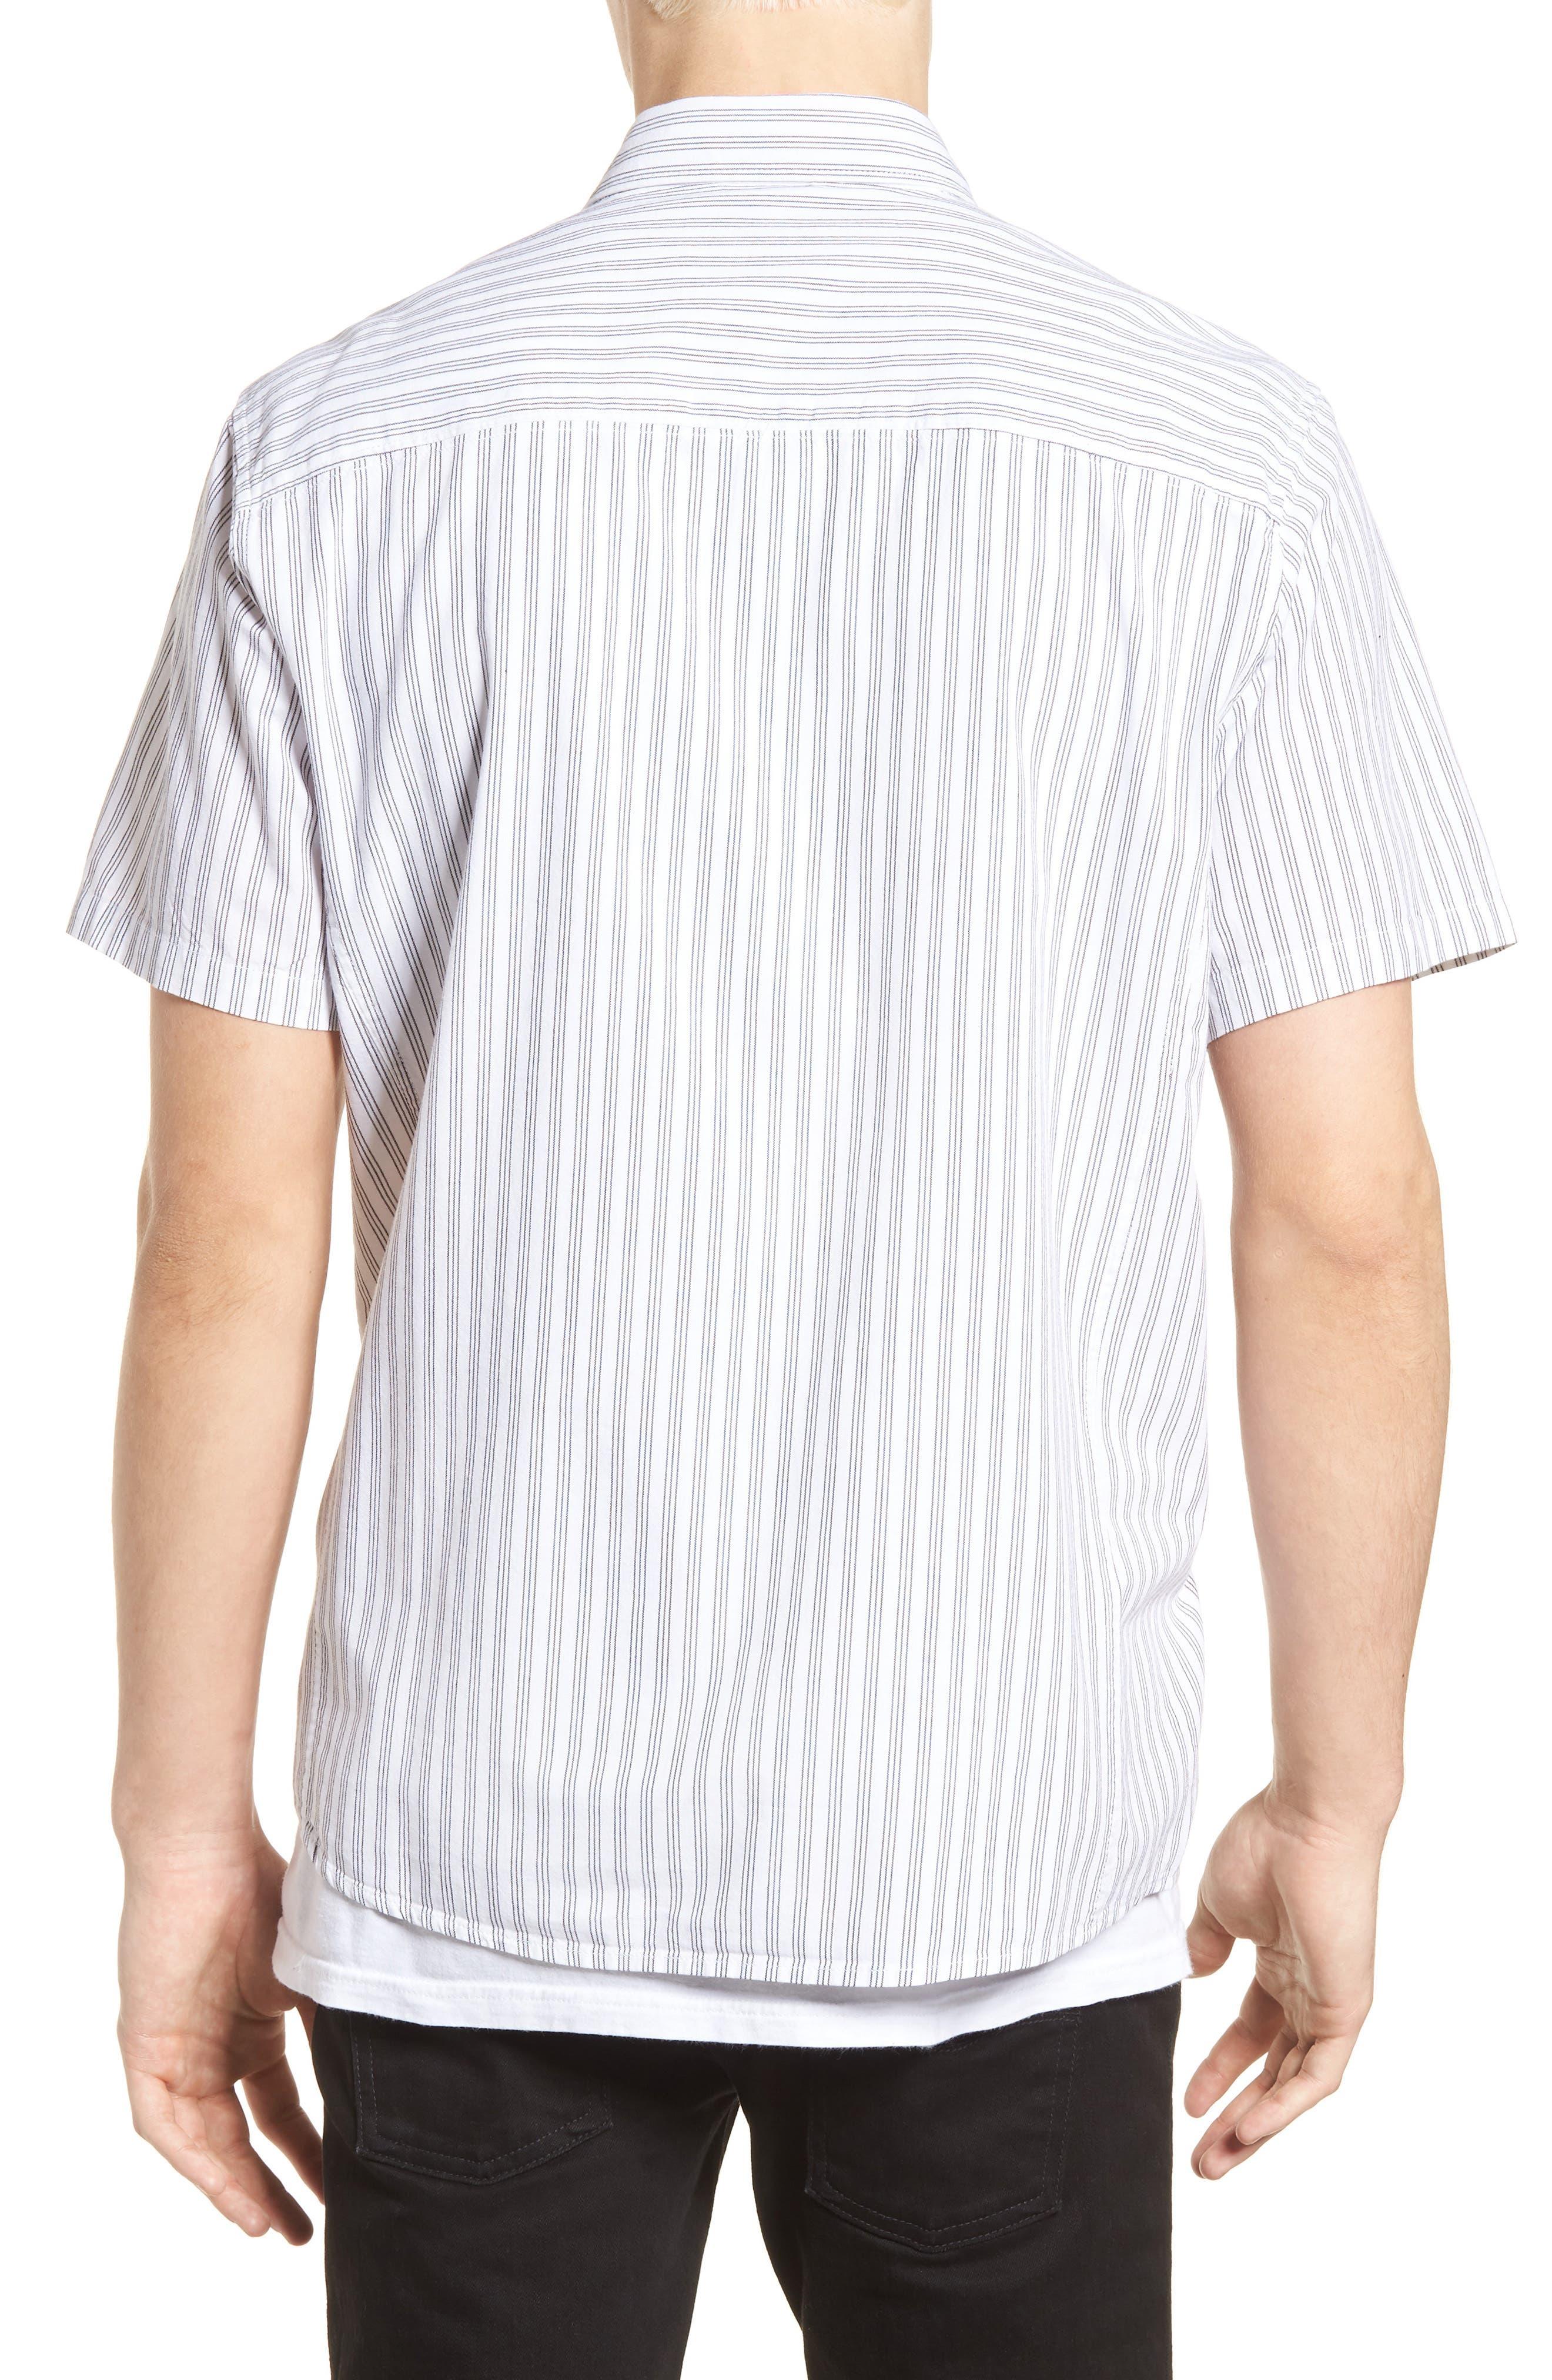 Rollins Woven Shirt,                             Alternate thumbnail 2, color,                             Black/White Stripe